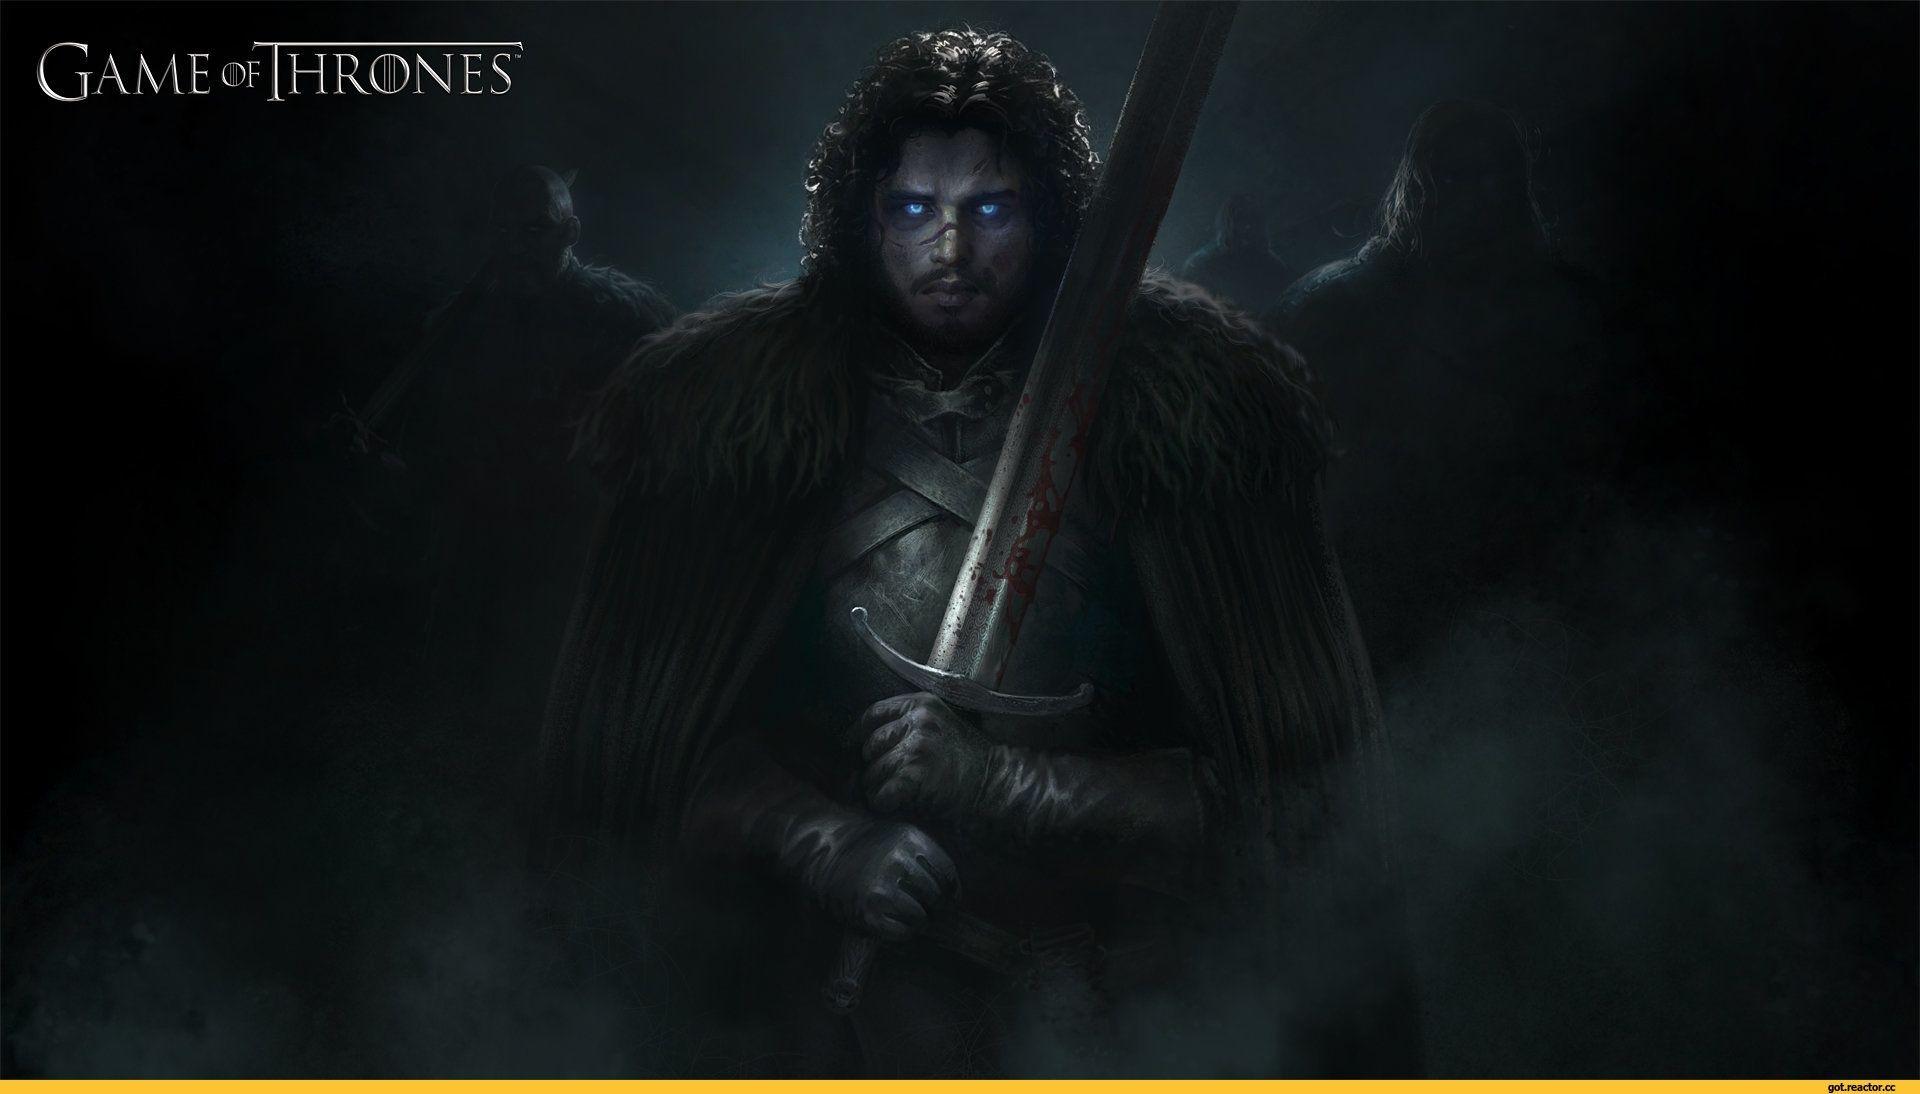 Game of Thrones Jon Snow fanart